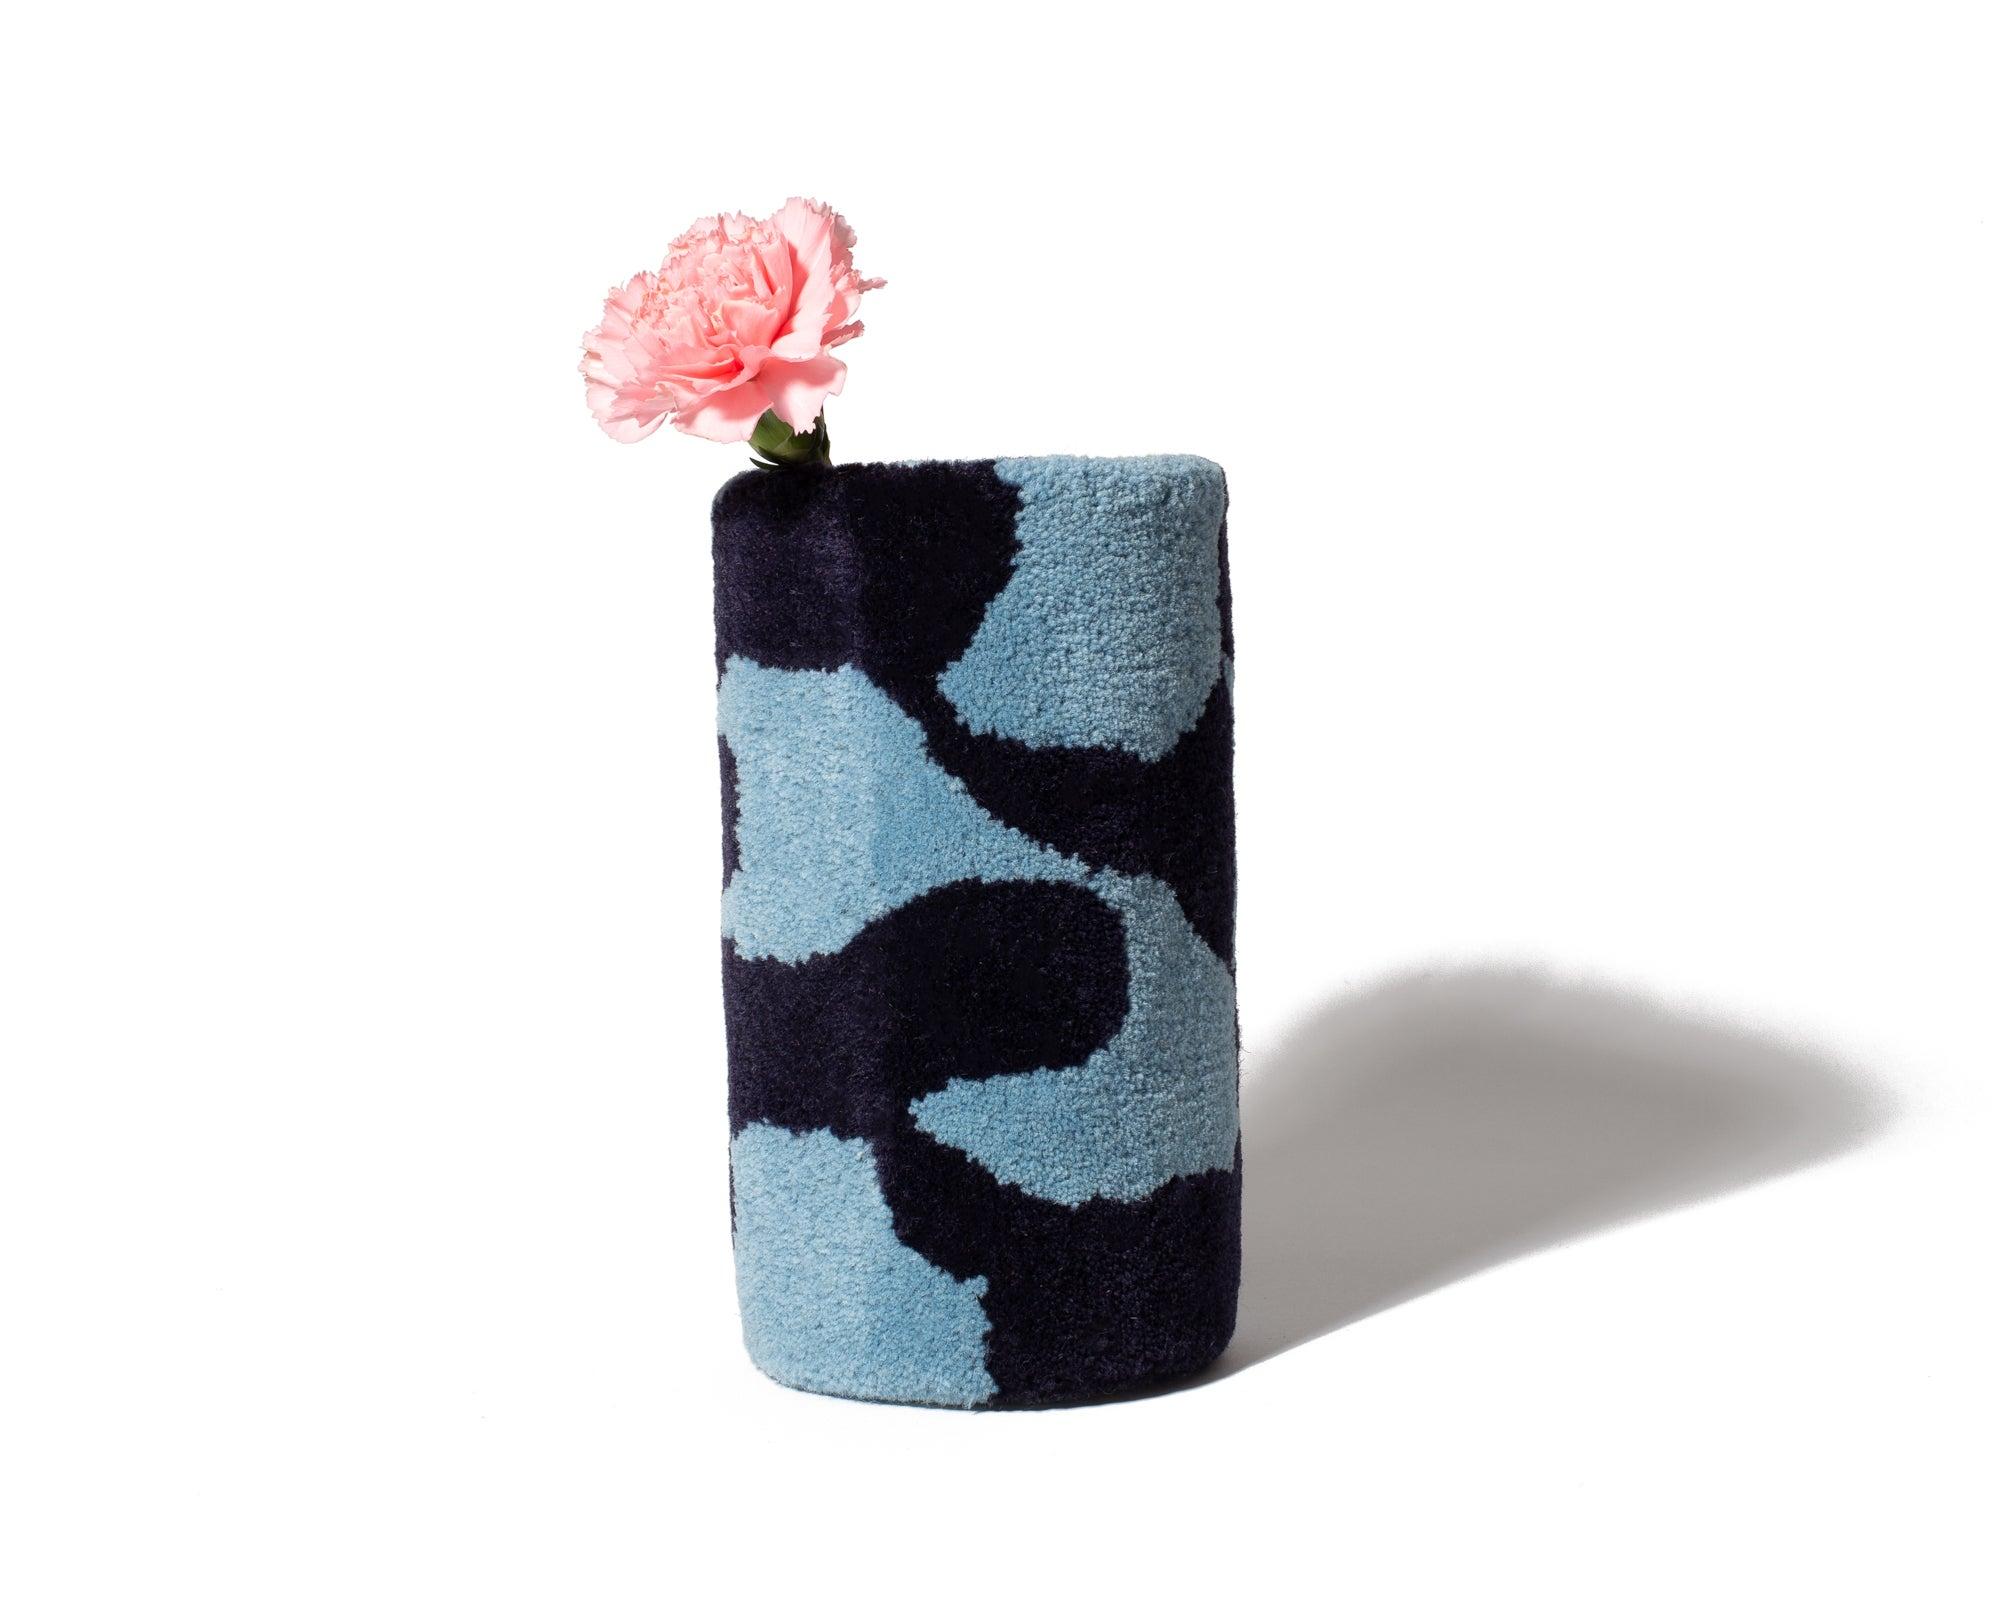 blue and black fury vase